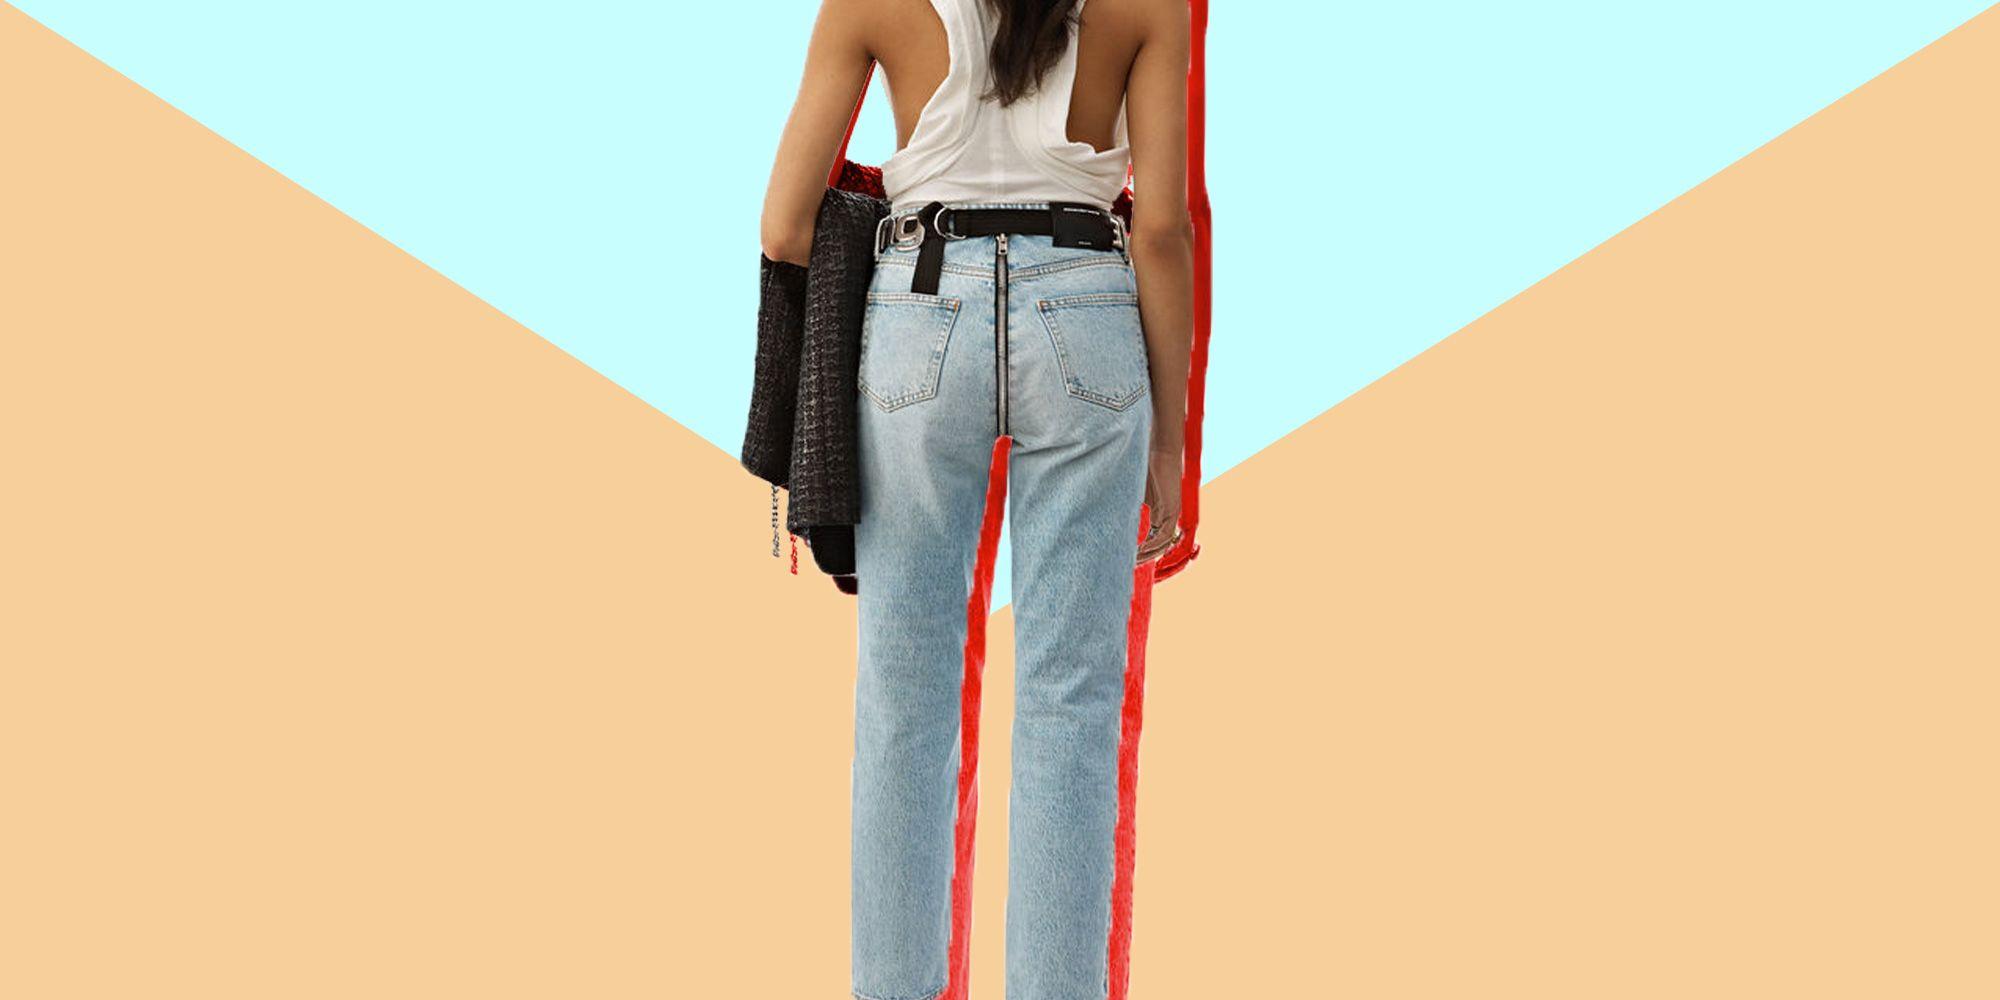 73910840cf36 jeans-primavera-estate-2019-alexander-wang-jeans-zip-sedere-foto-1550506660.jpg